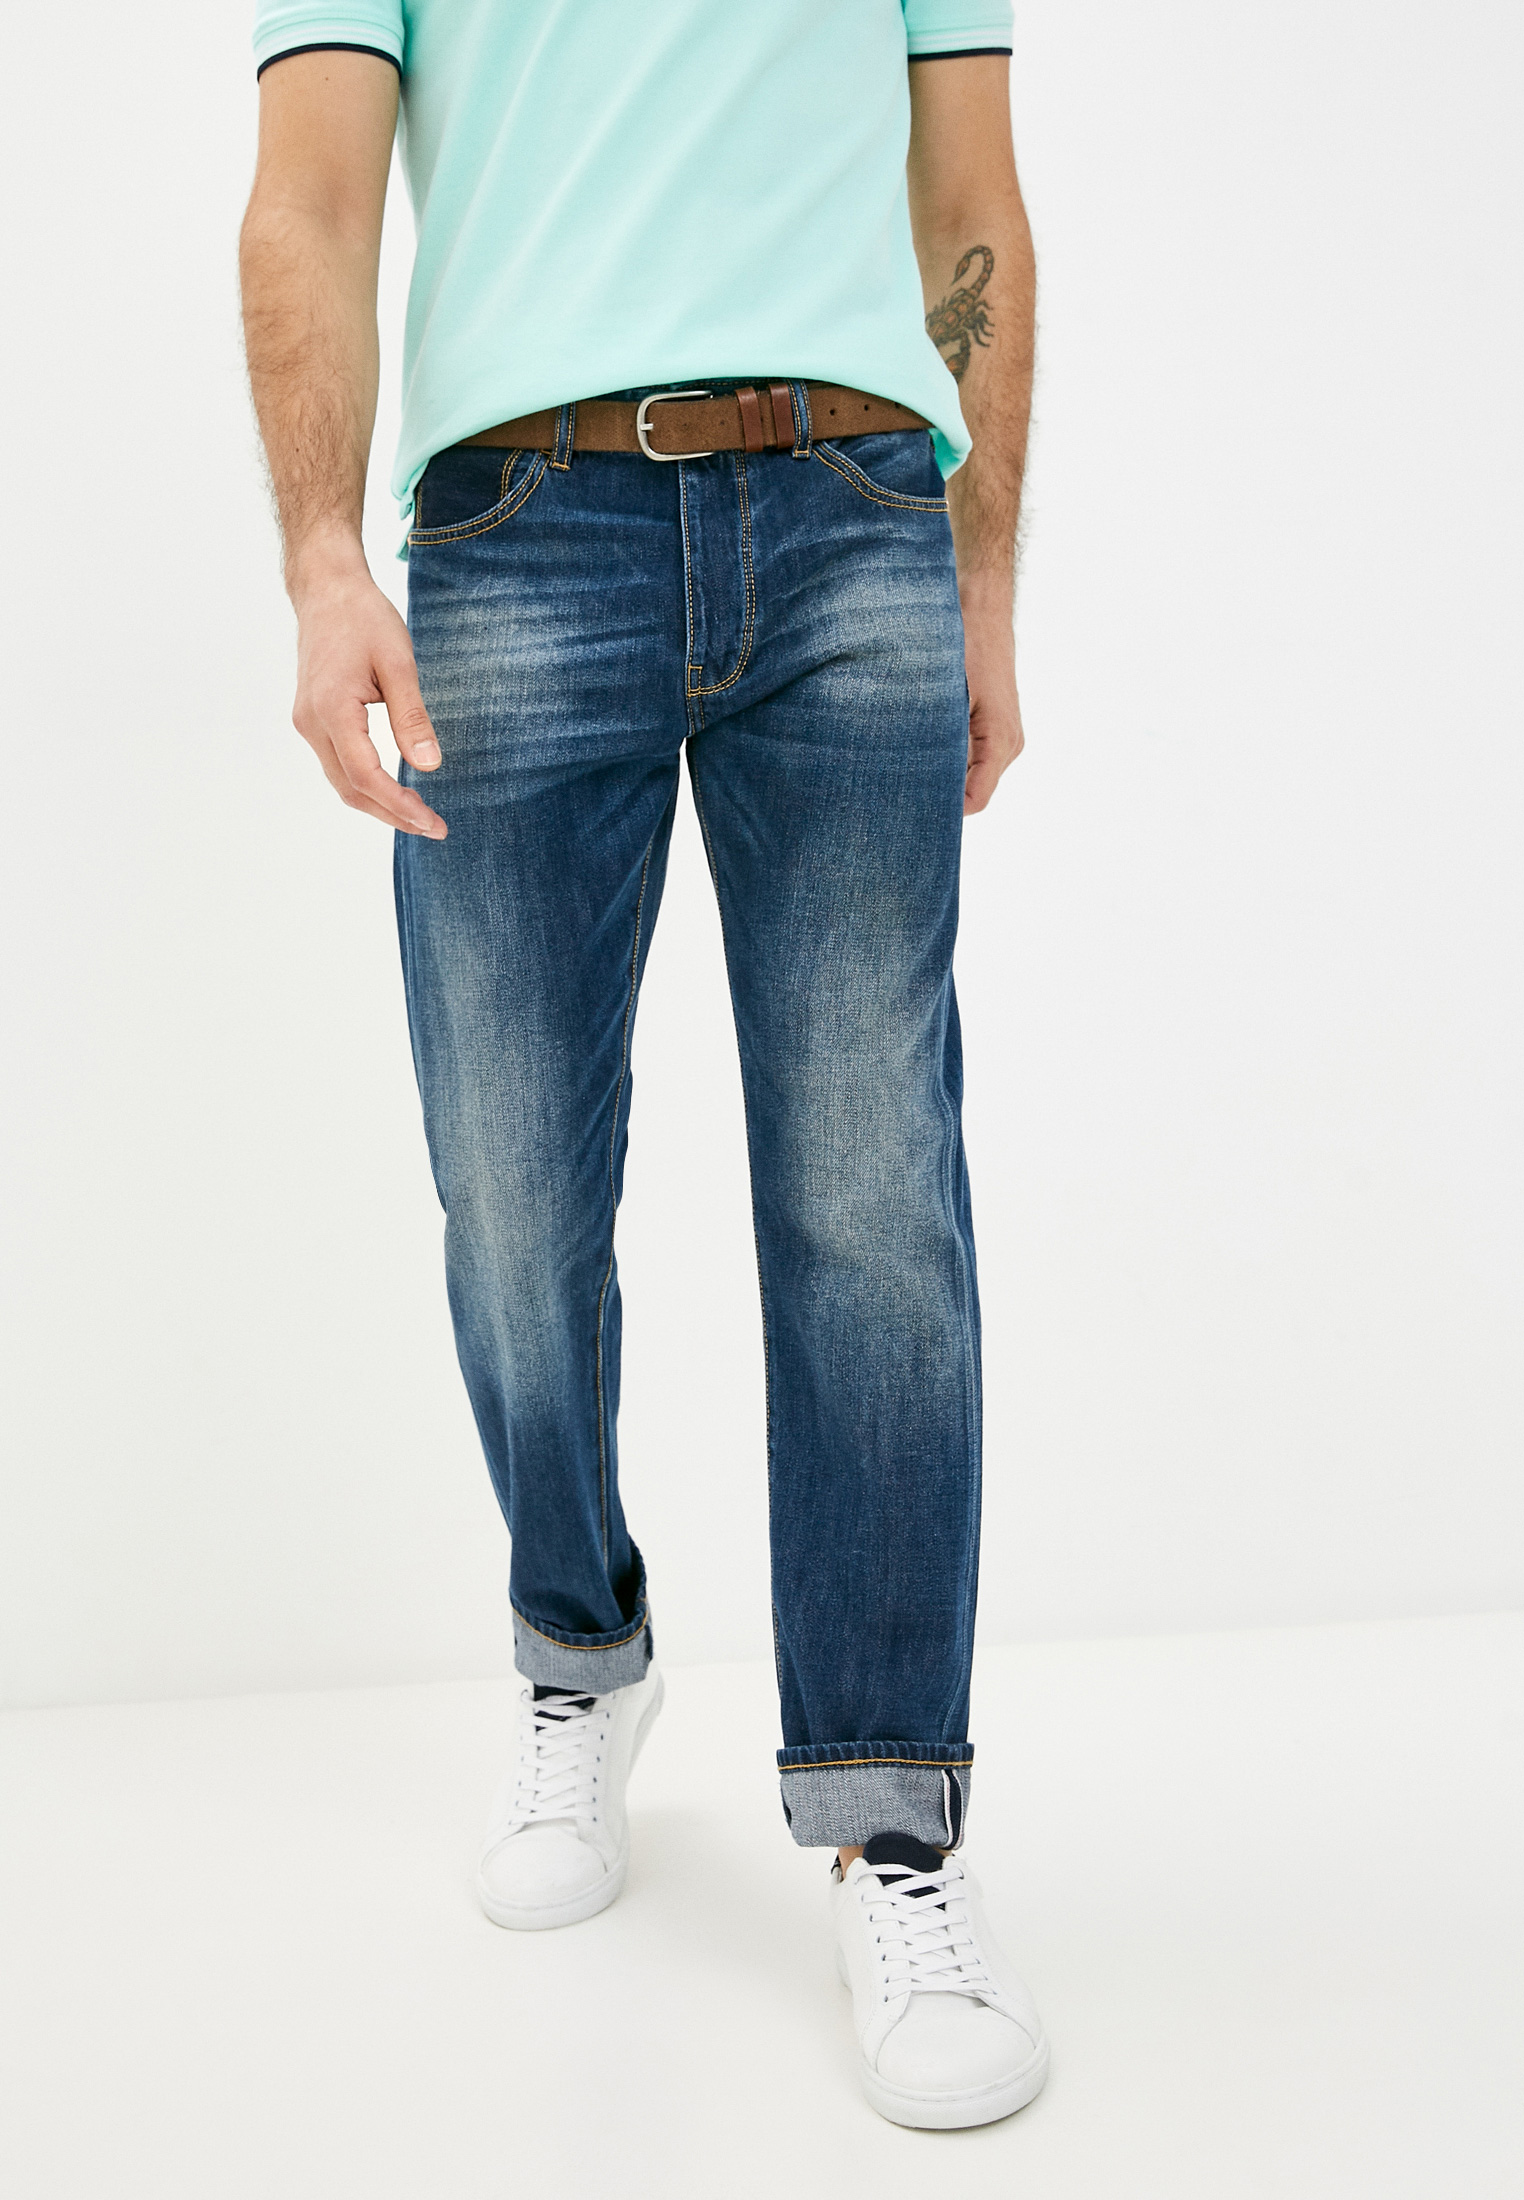 Зауженные джинсы United Colors of Benetton (Юнайтед Колорс оф Бенеттон) 4MBD57CK8